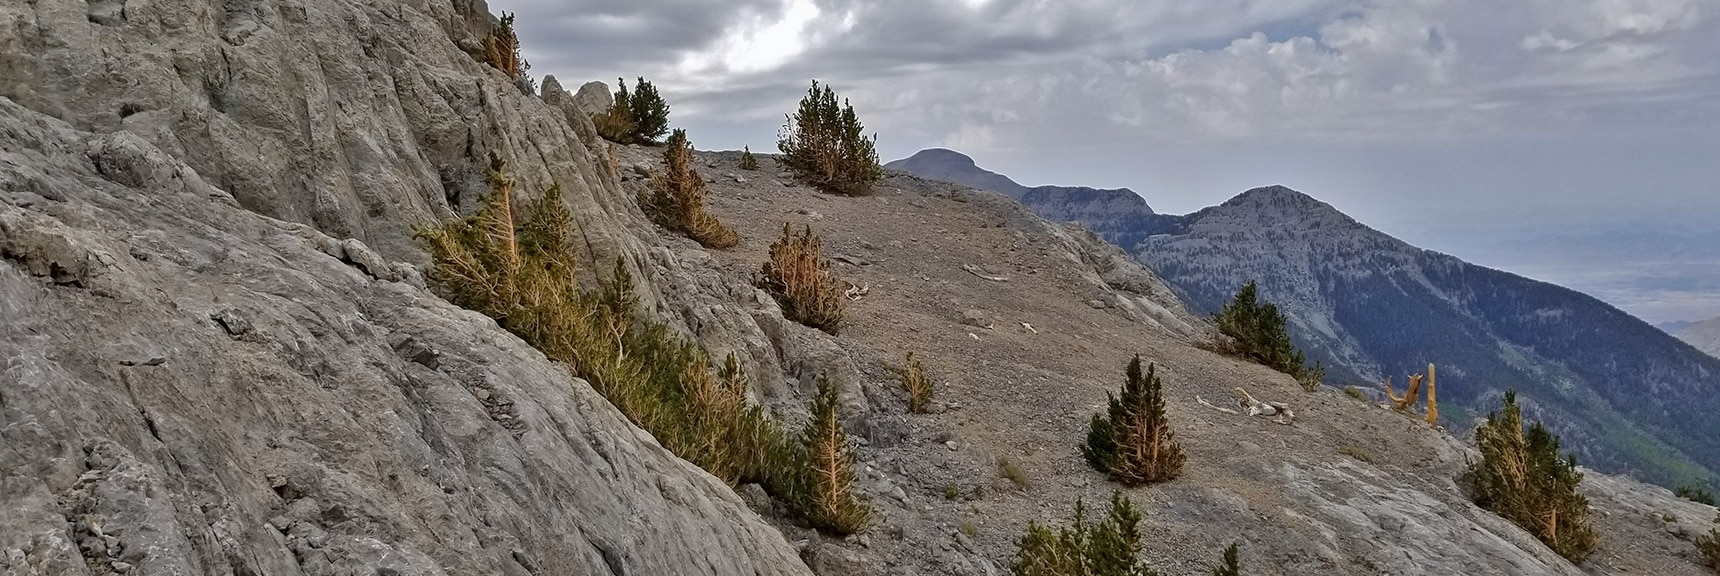 Base of Western Cliffs Looking Toward Charleston and Lee Peaks   Mummy Mountain Northern Rim Overlook, Spring Mountain Wilderness, Nevada